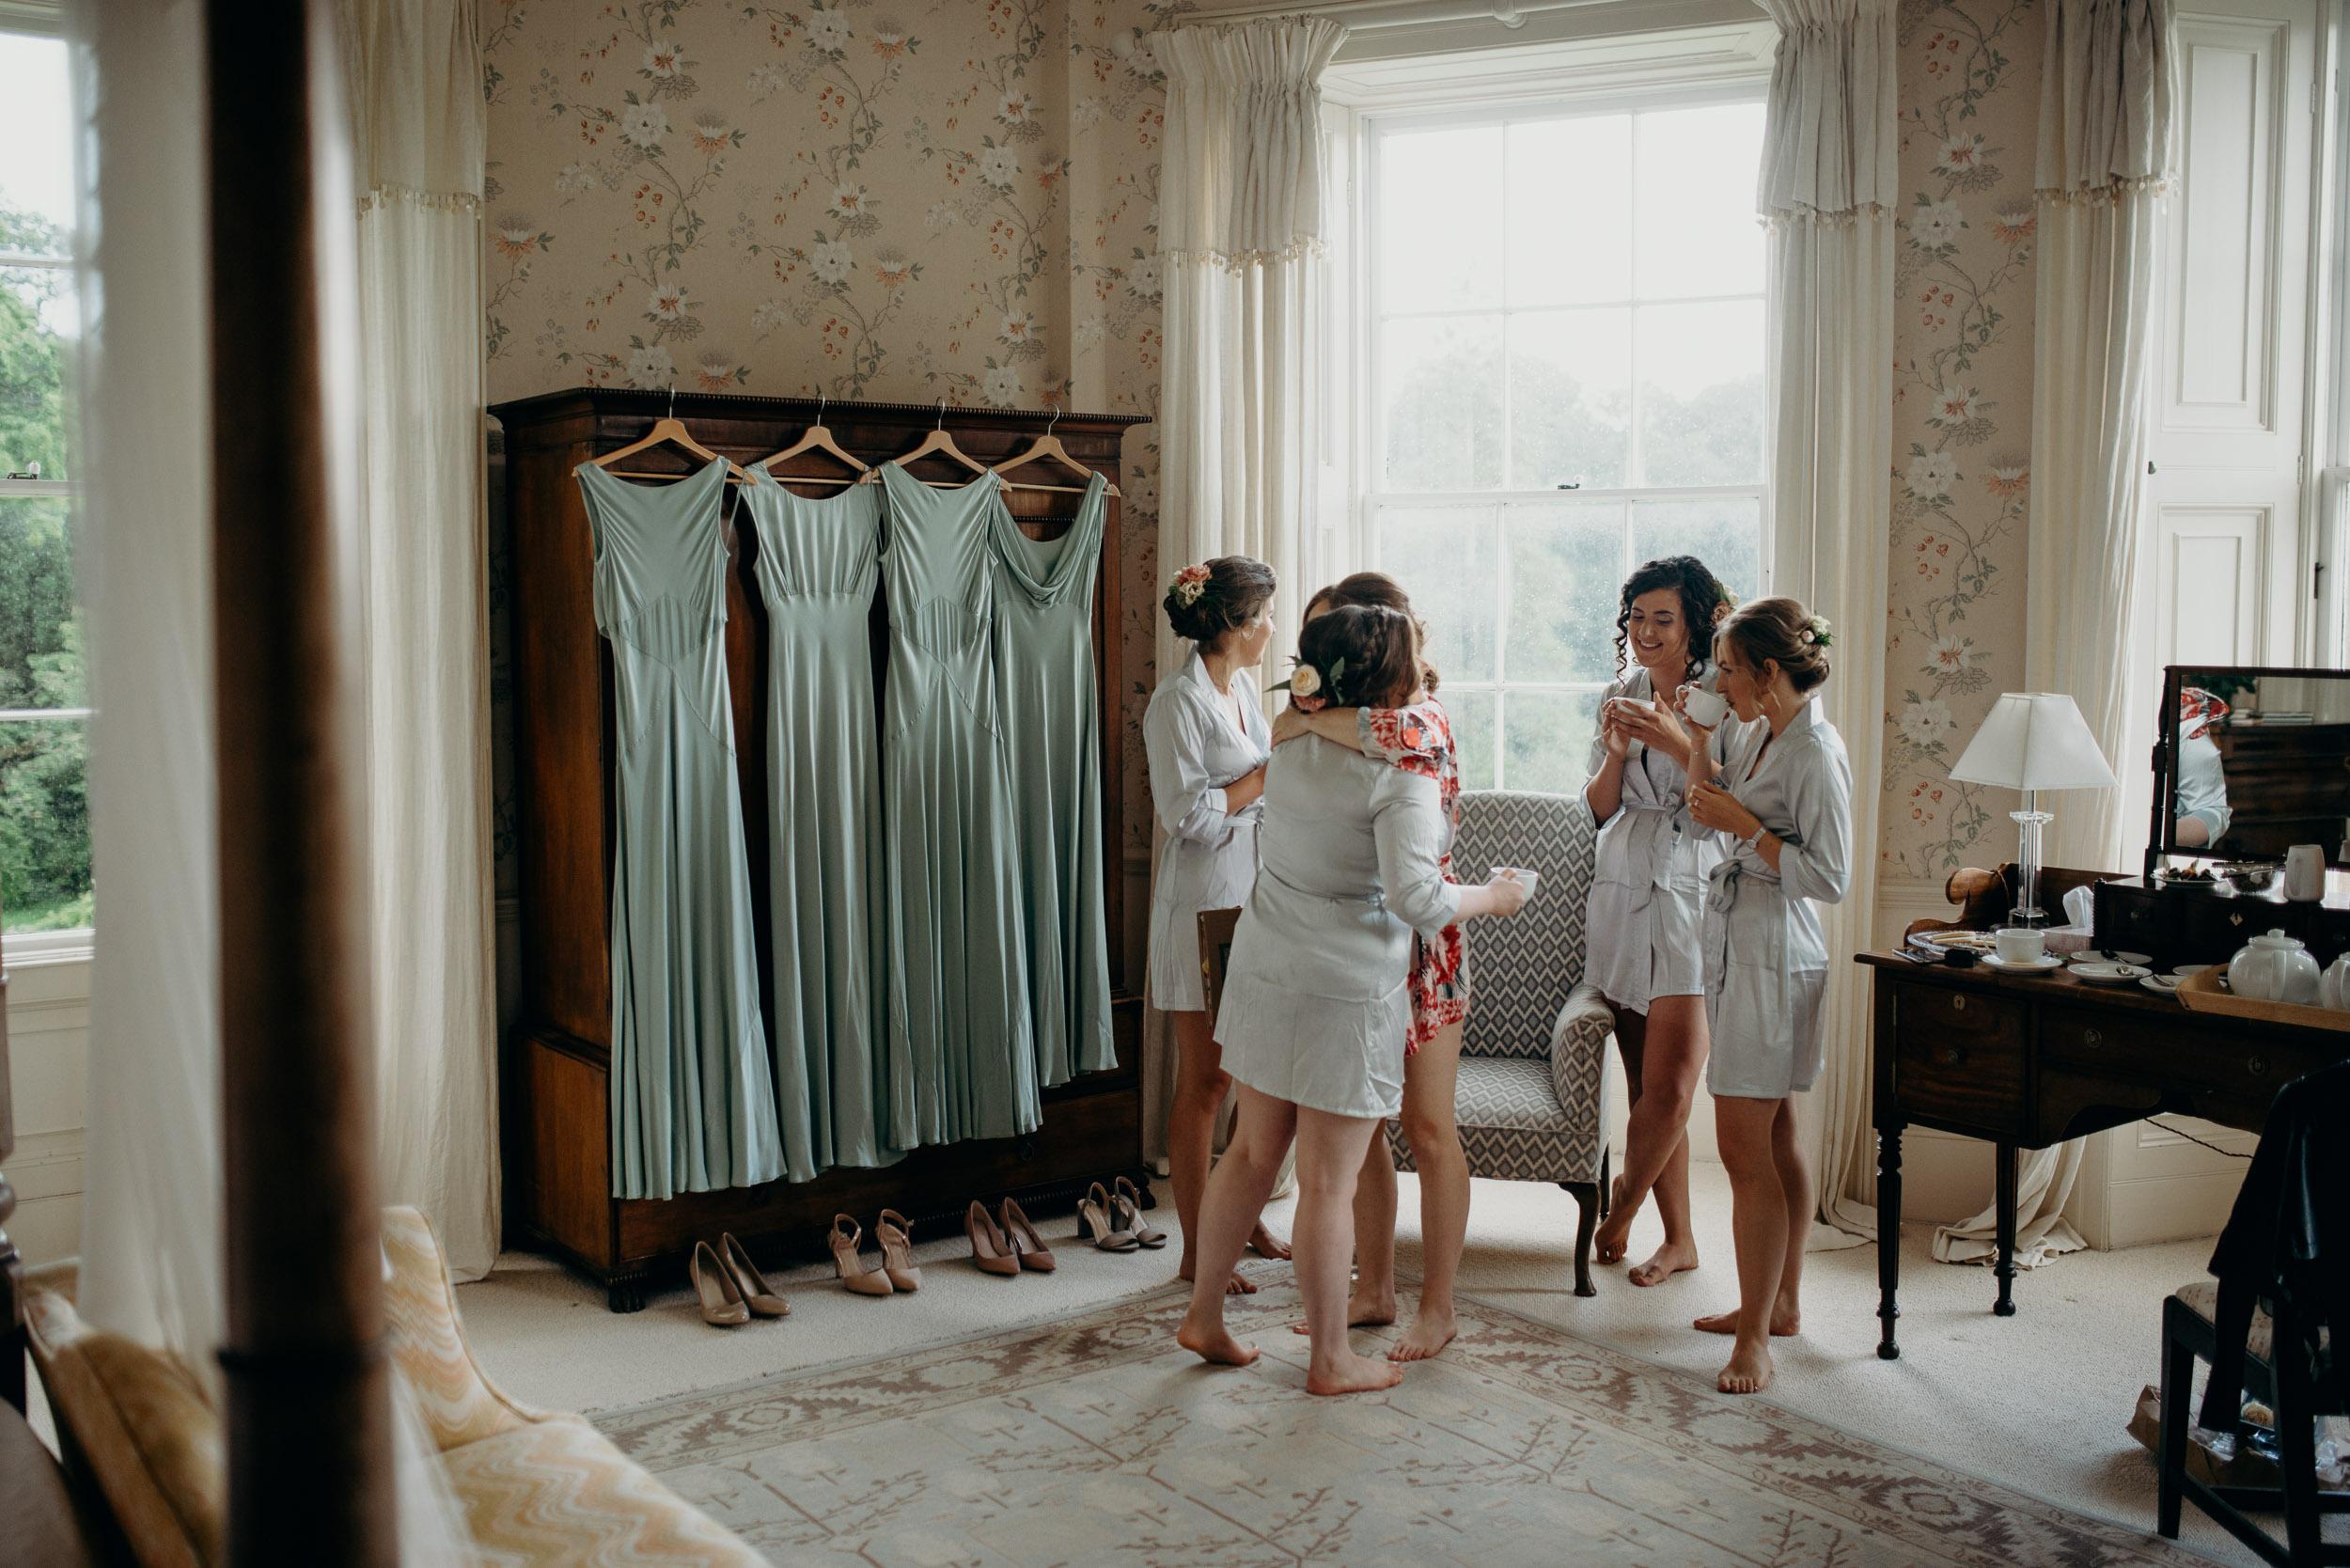 drenagh estate wedding photography-10.jpg